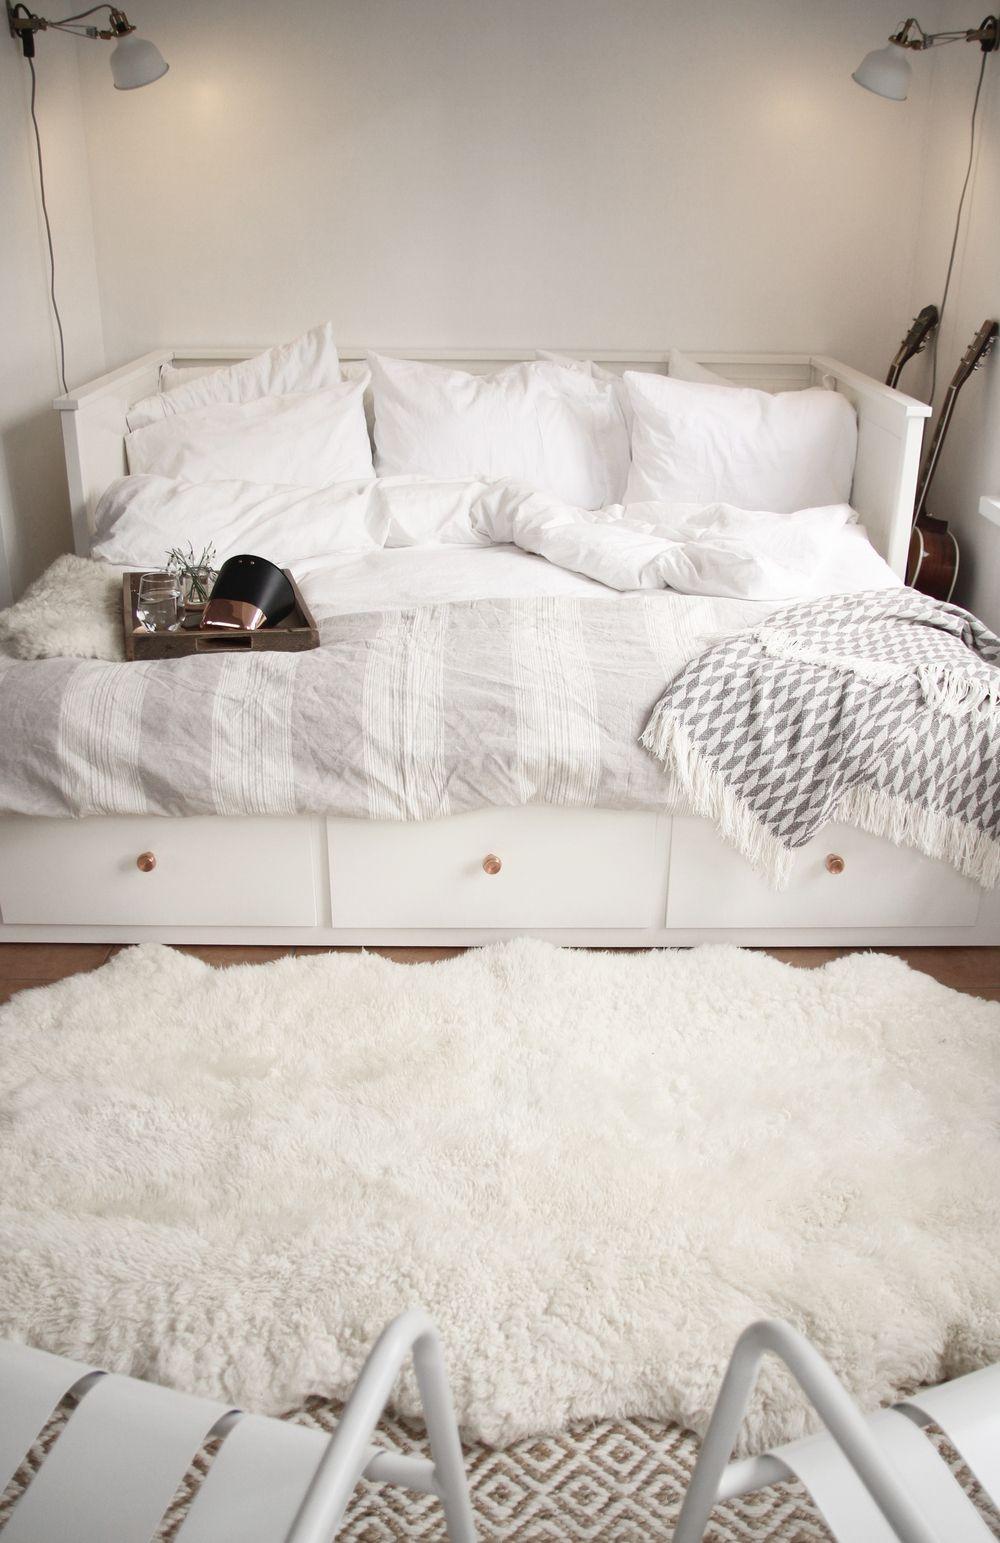 50+ Best Ikea Hemnes Daybed